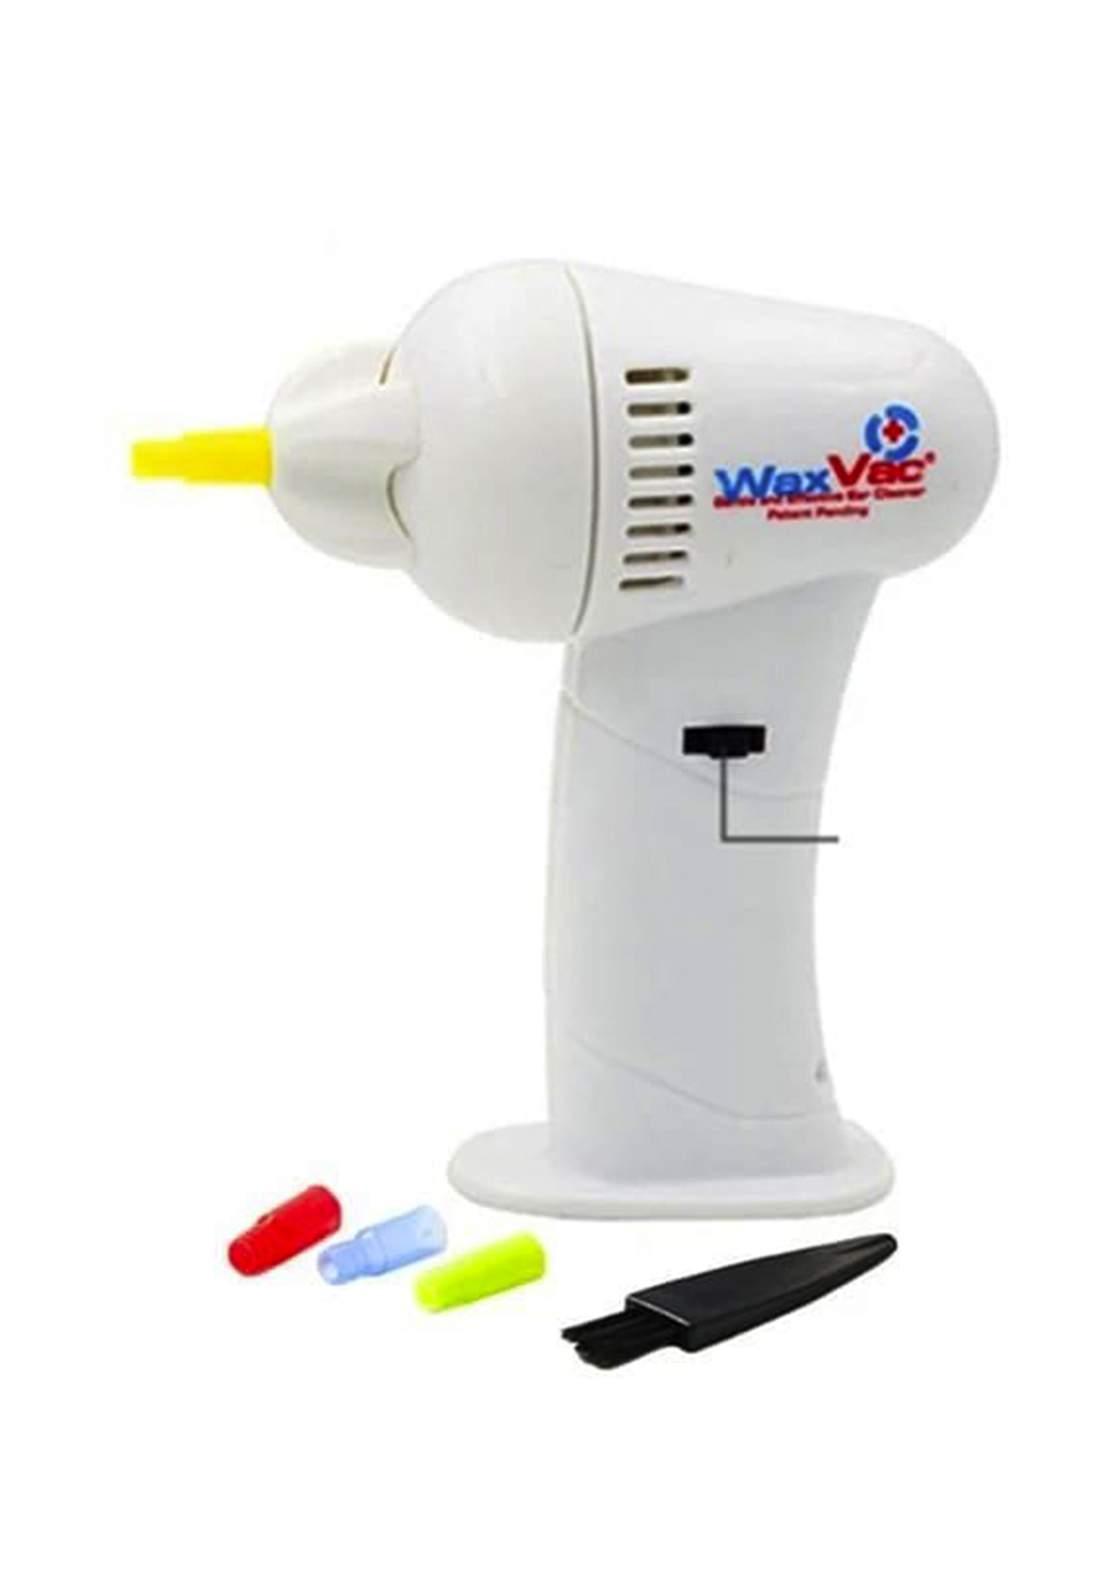 Wireless Electric Ear Cleaning Kit جهاز ازالة شمع الاذن